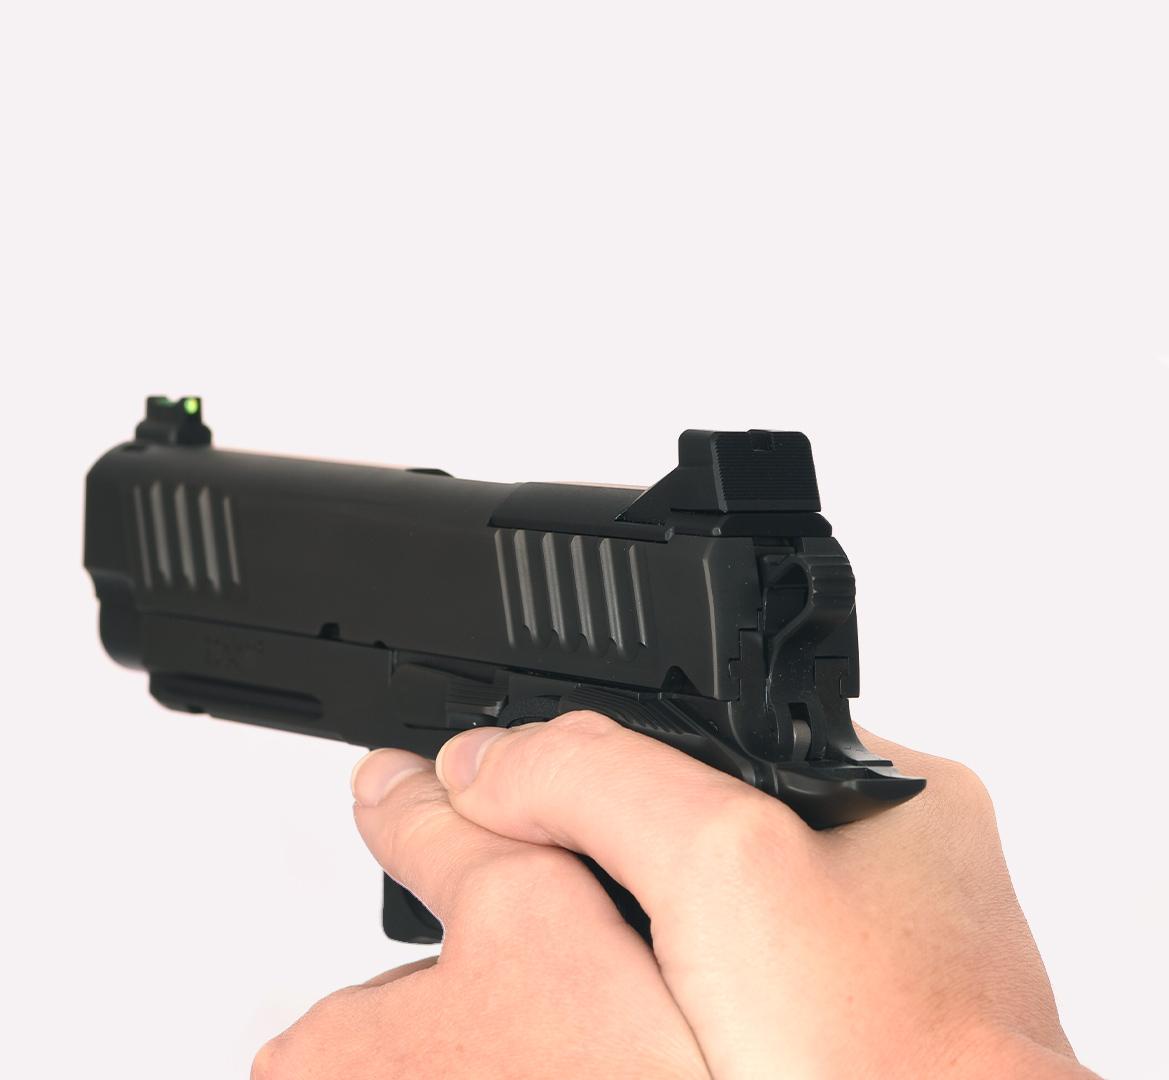 Pair of hands gripping Staccato handgun